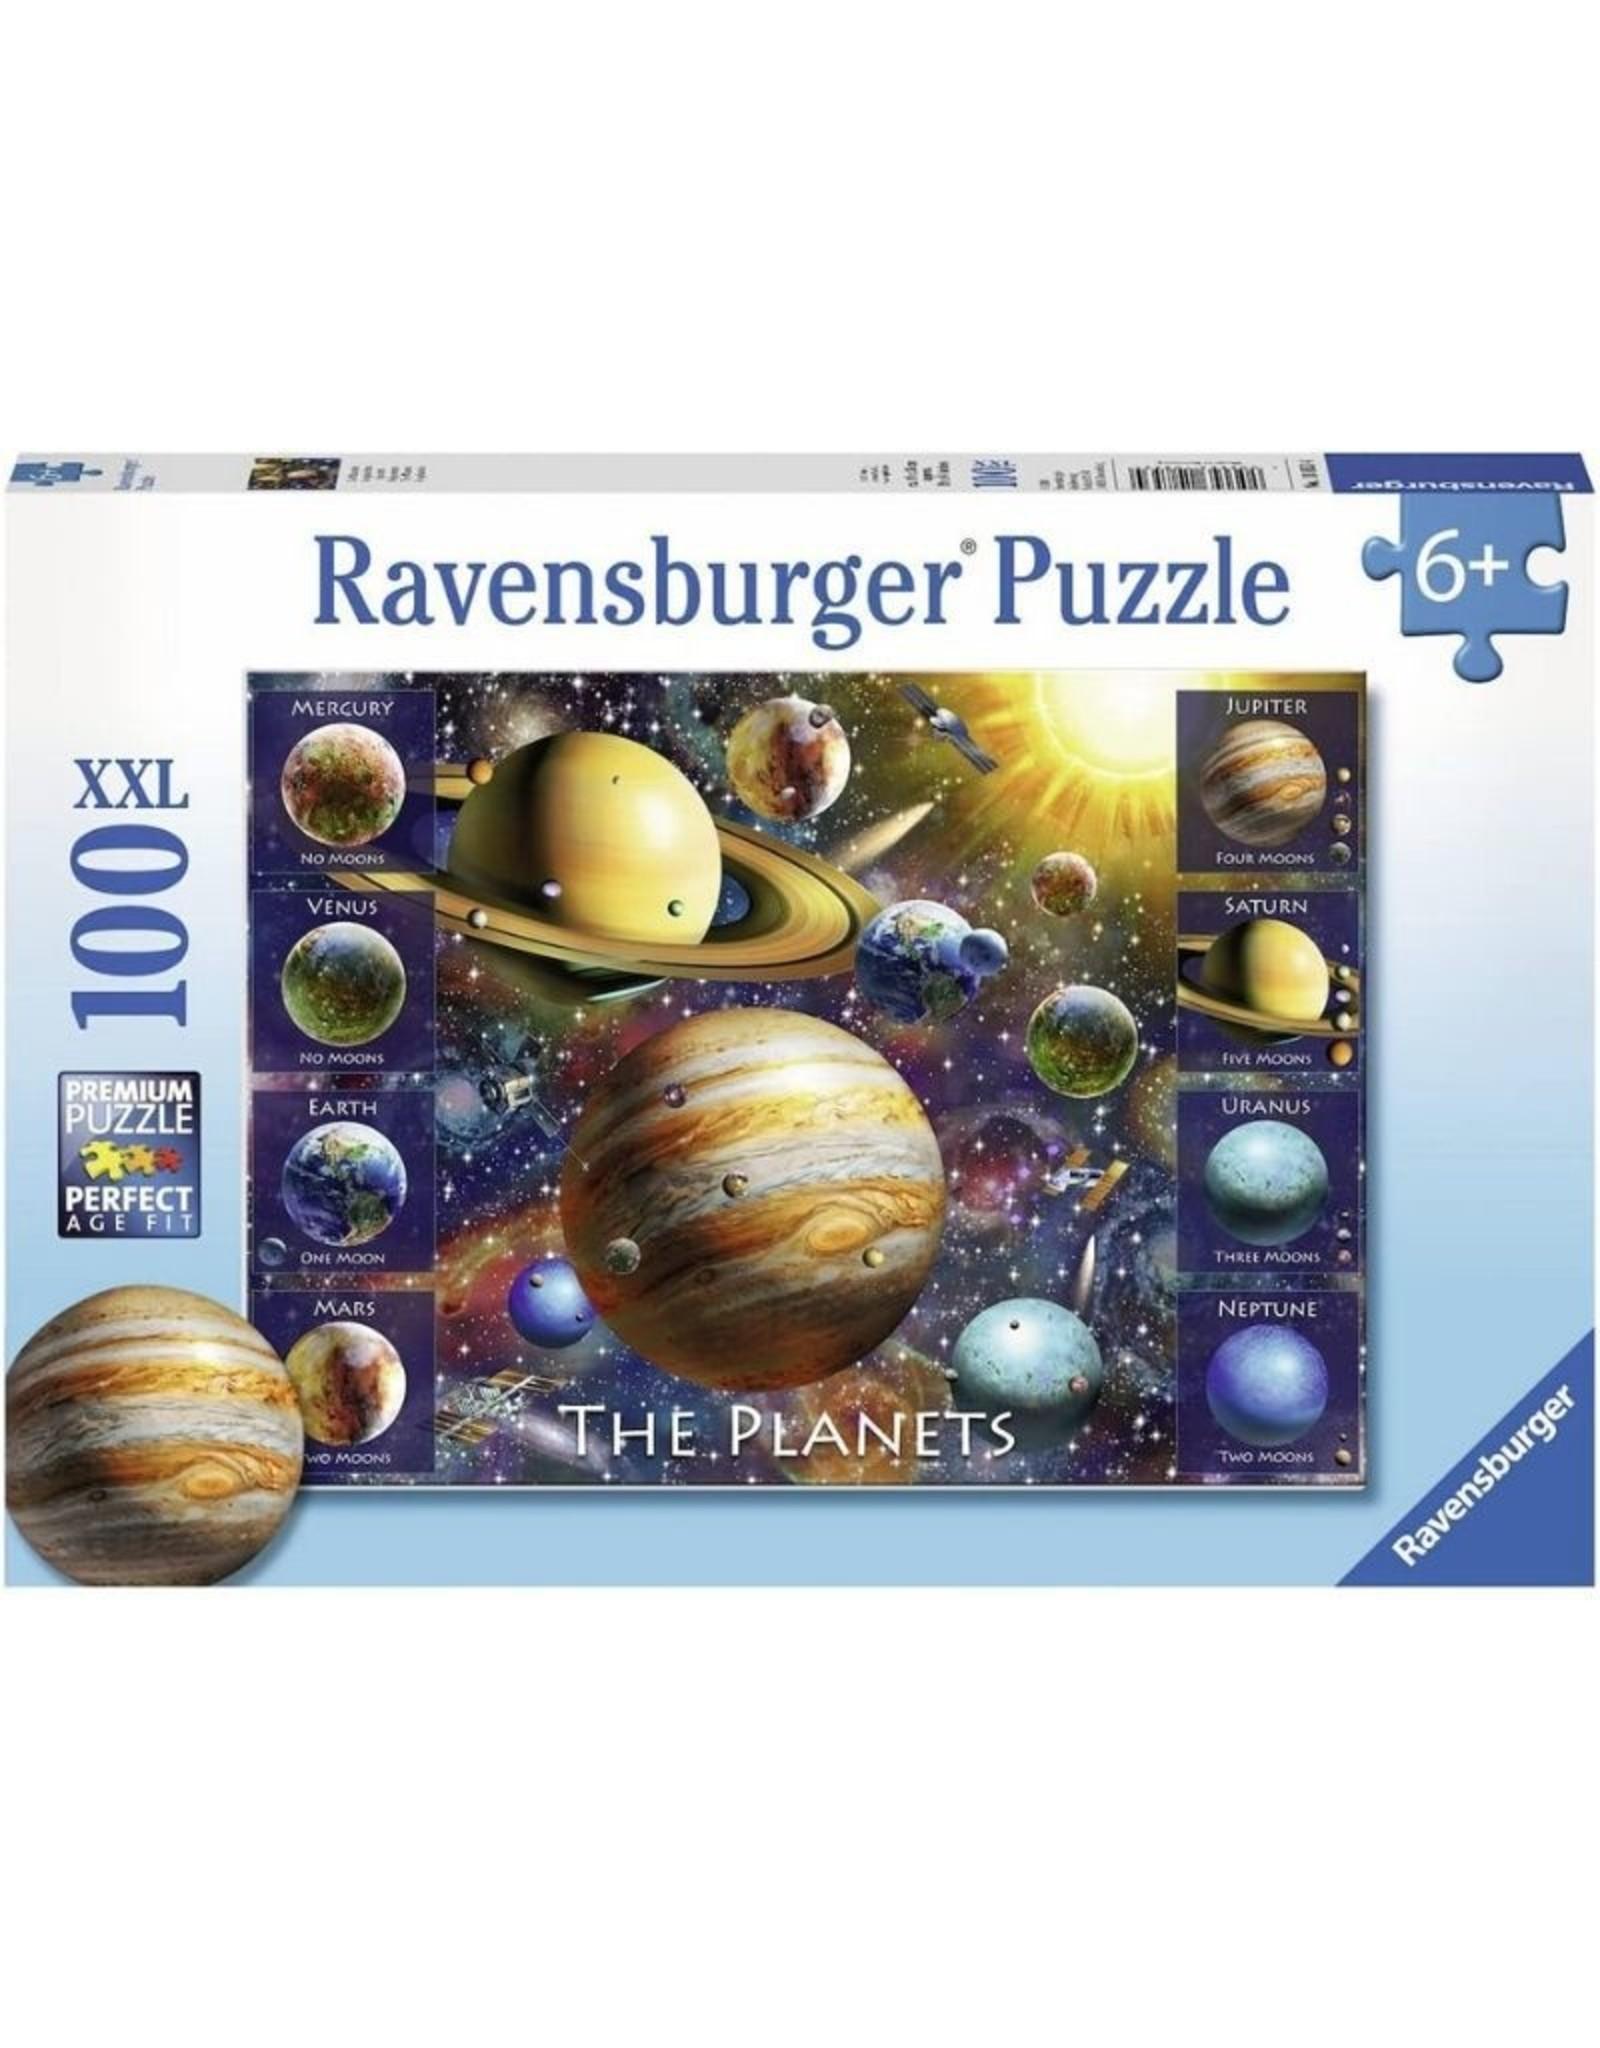 Ravensburger 10853 Planets